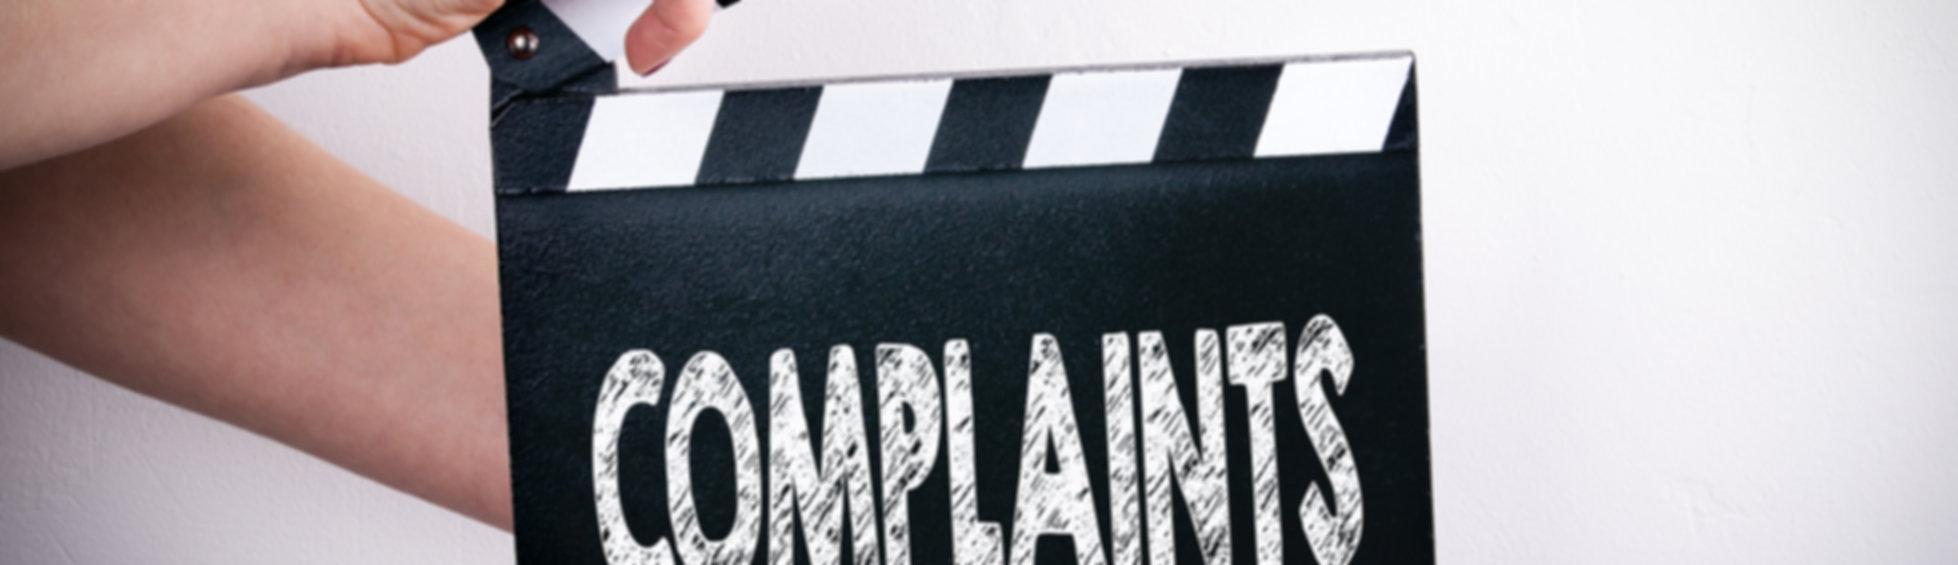 Complaints. Female hands holding movie c